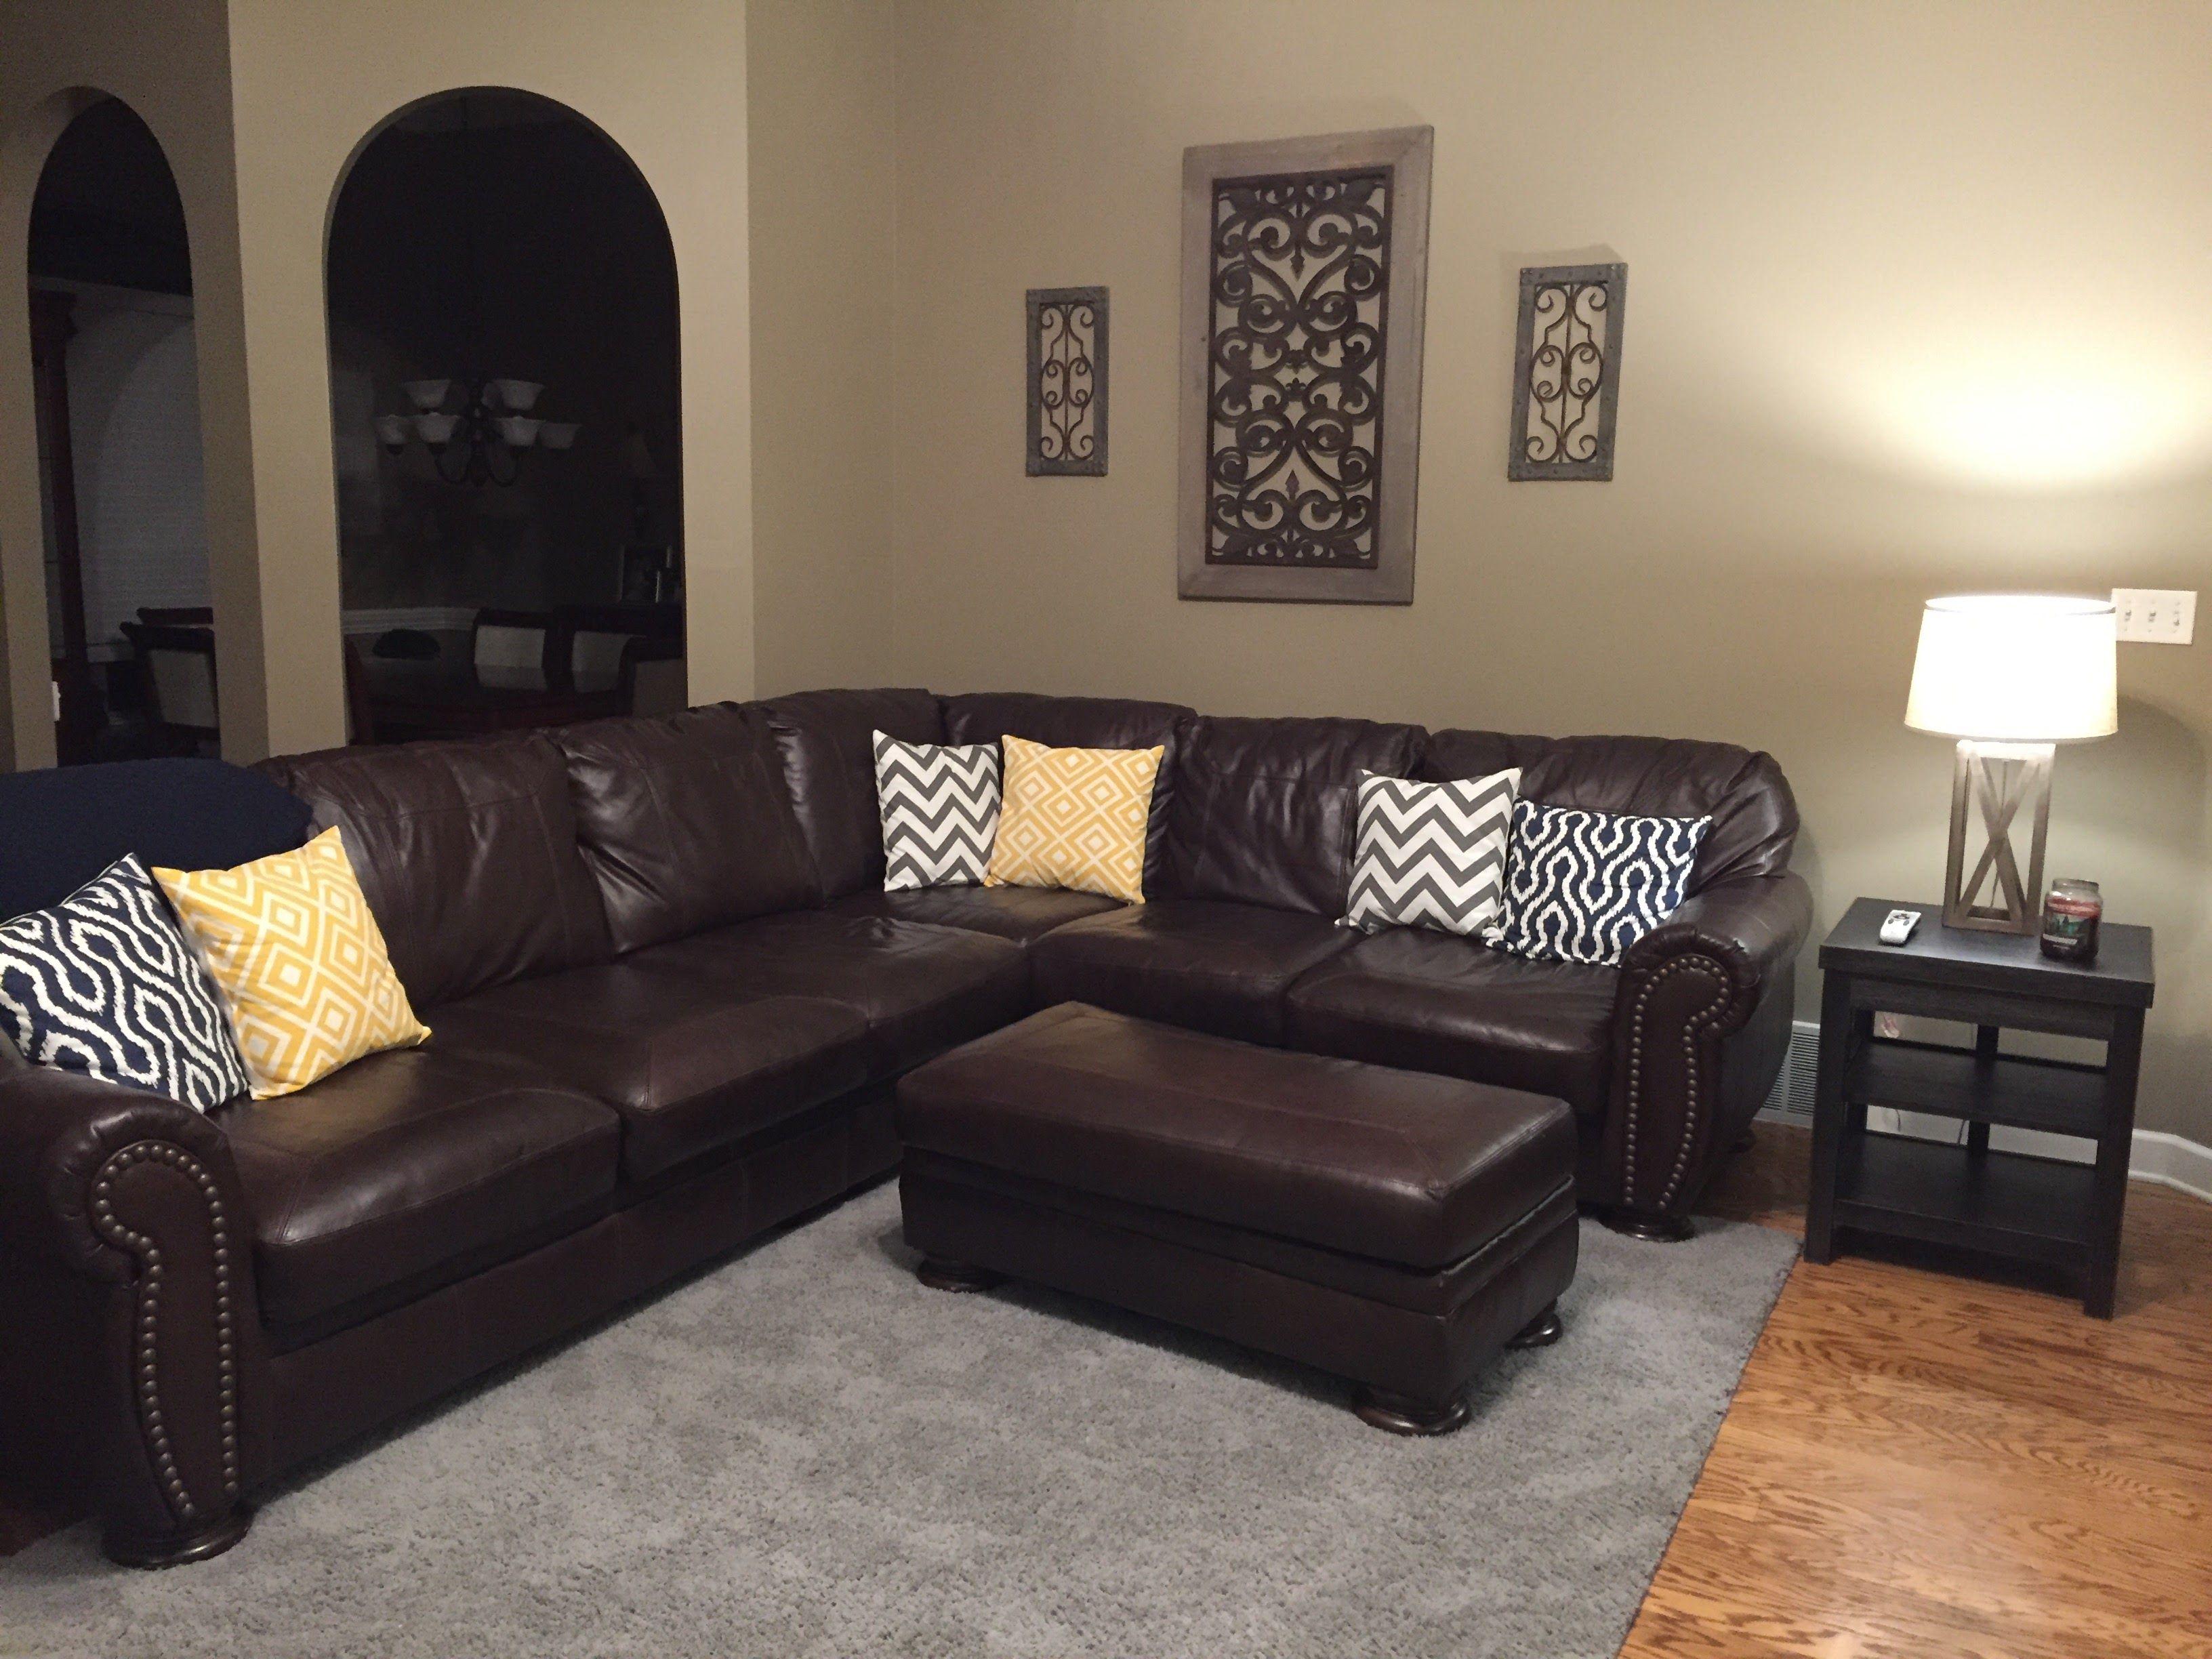 Best Wall Color Brown Sofa Grey Rug Black Living Room Decor 640 x 480